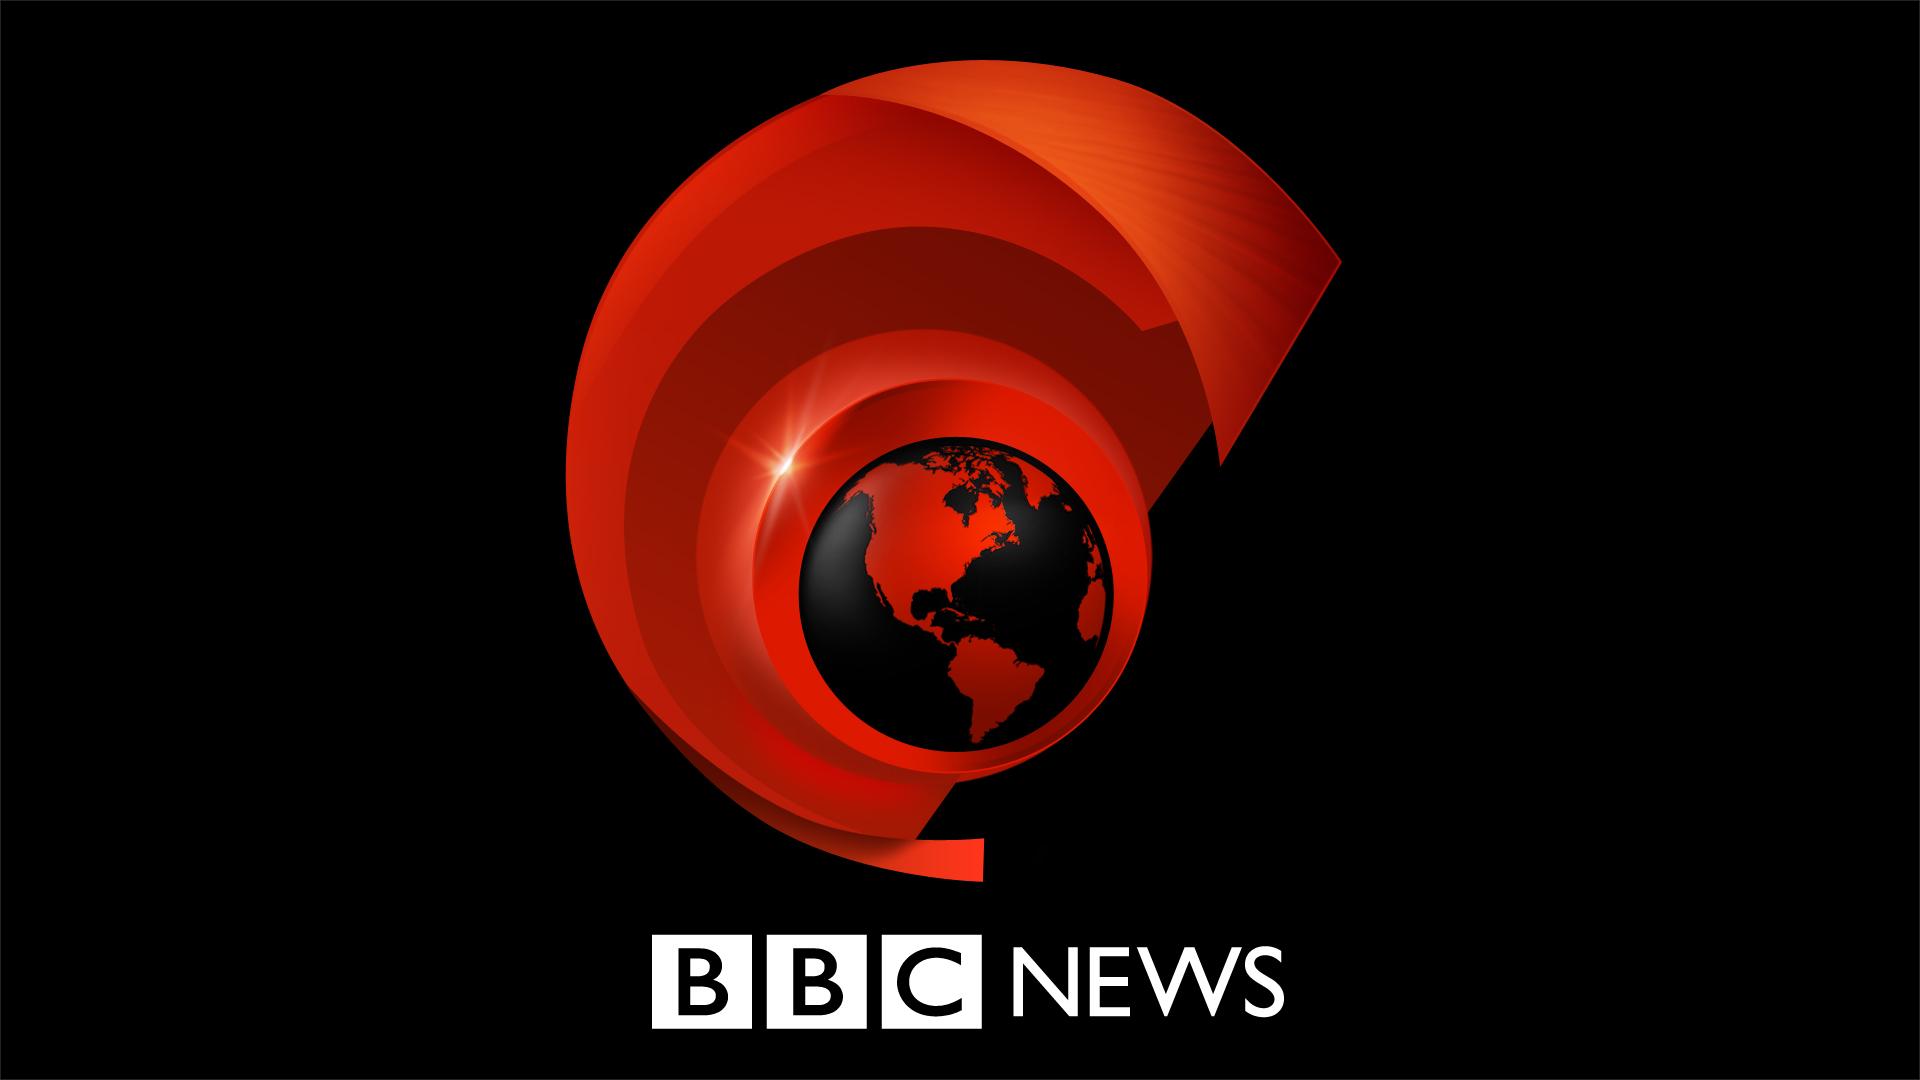 BBC News logo recreation - Page 2 - TV Forum